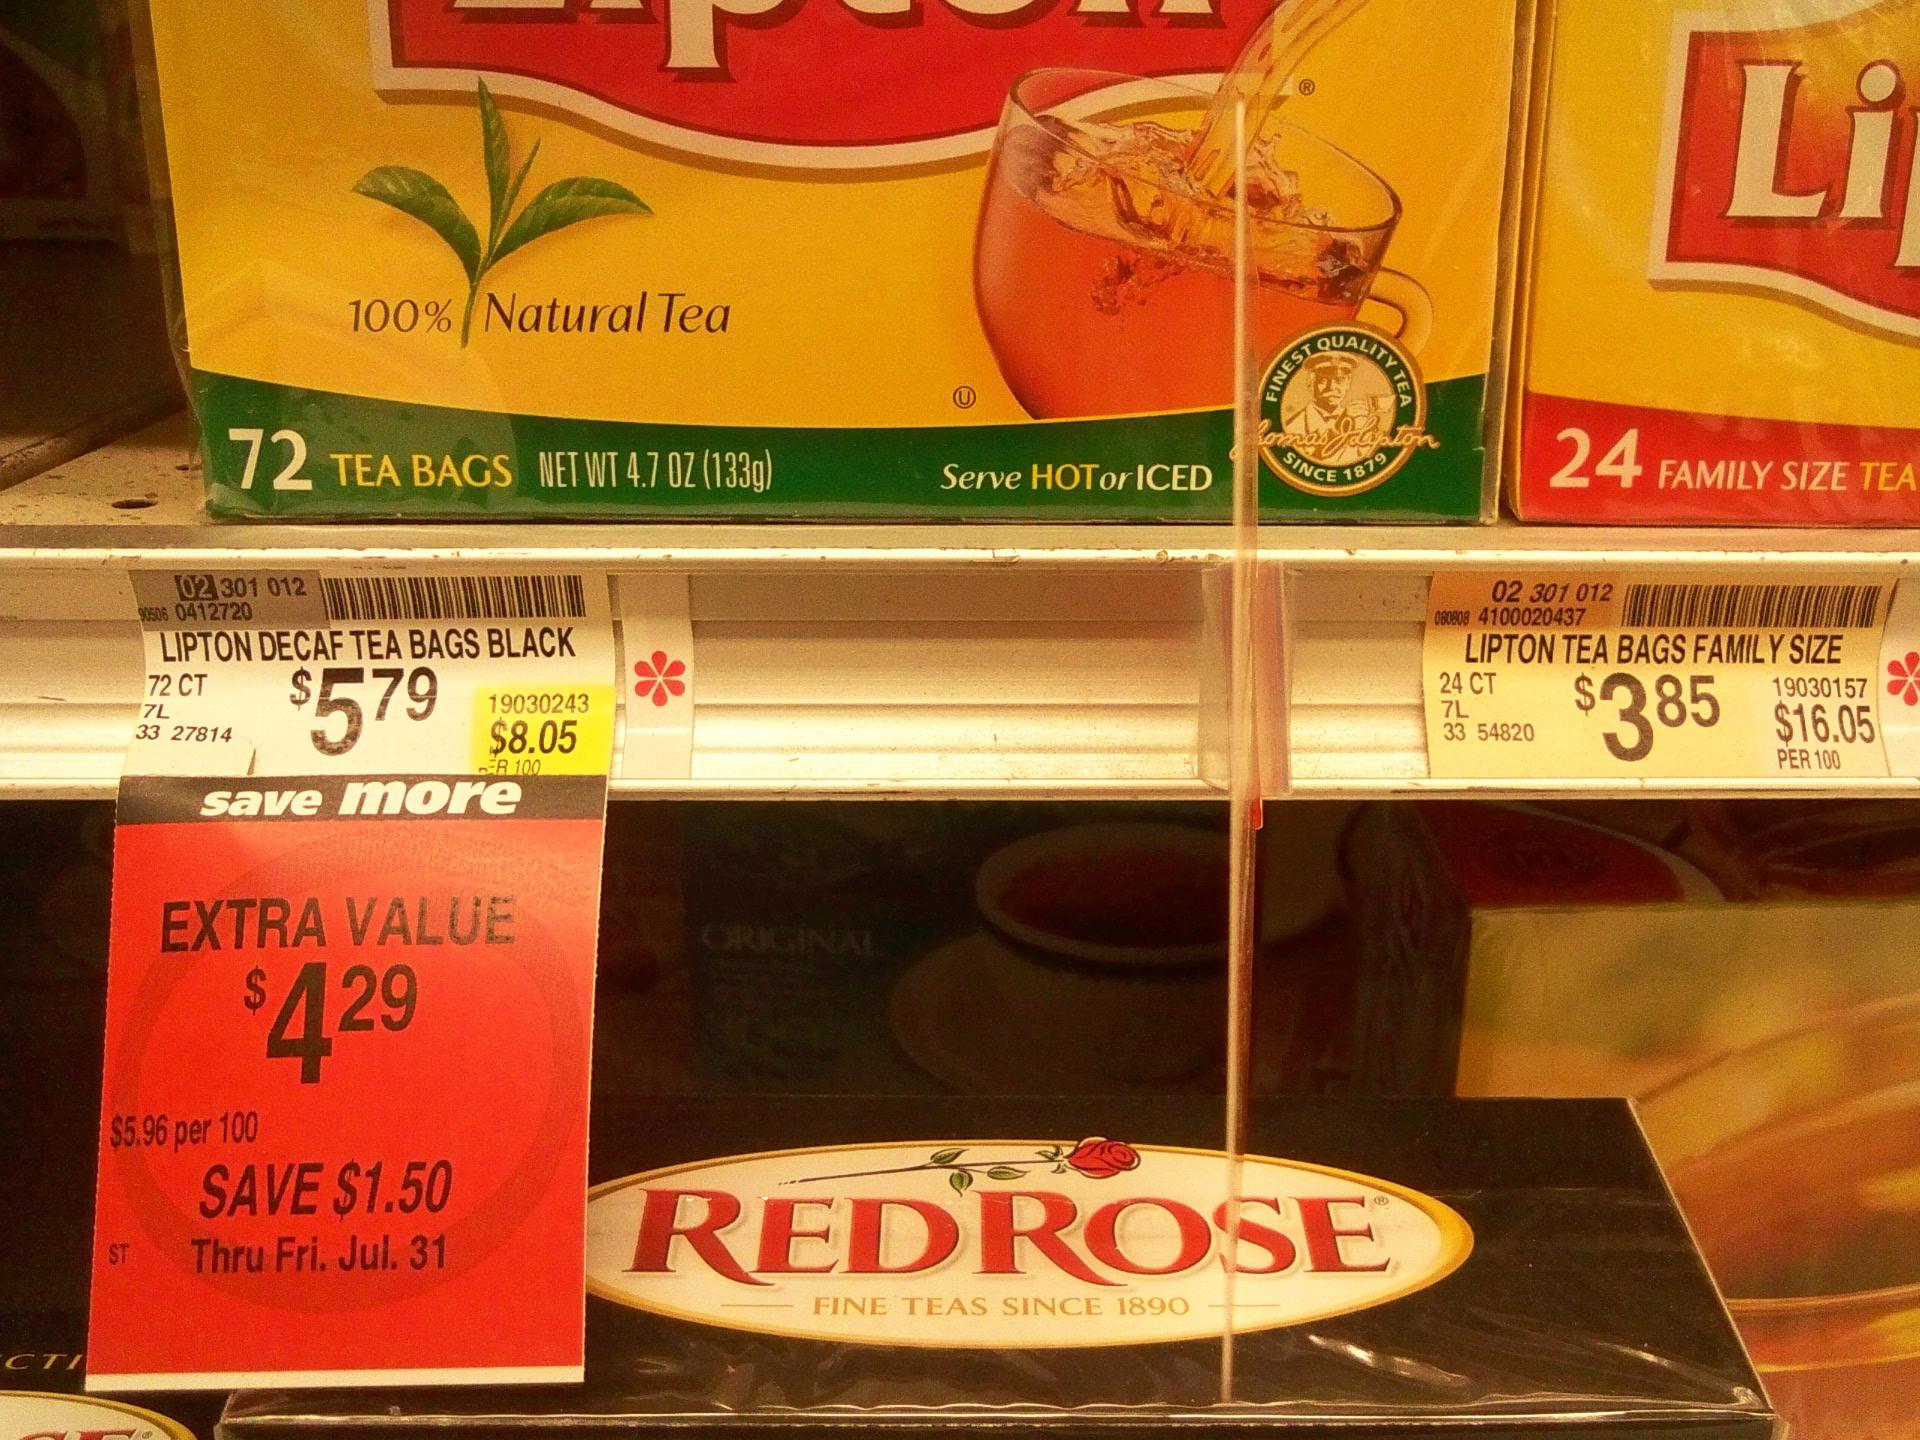 Picture of Plain Tea: $1.15 / Gal